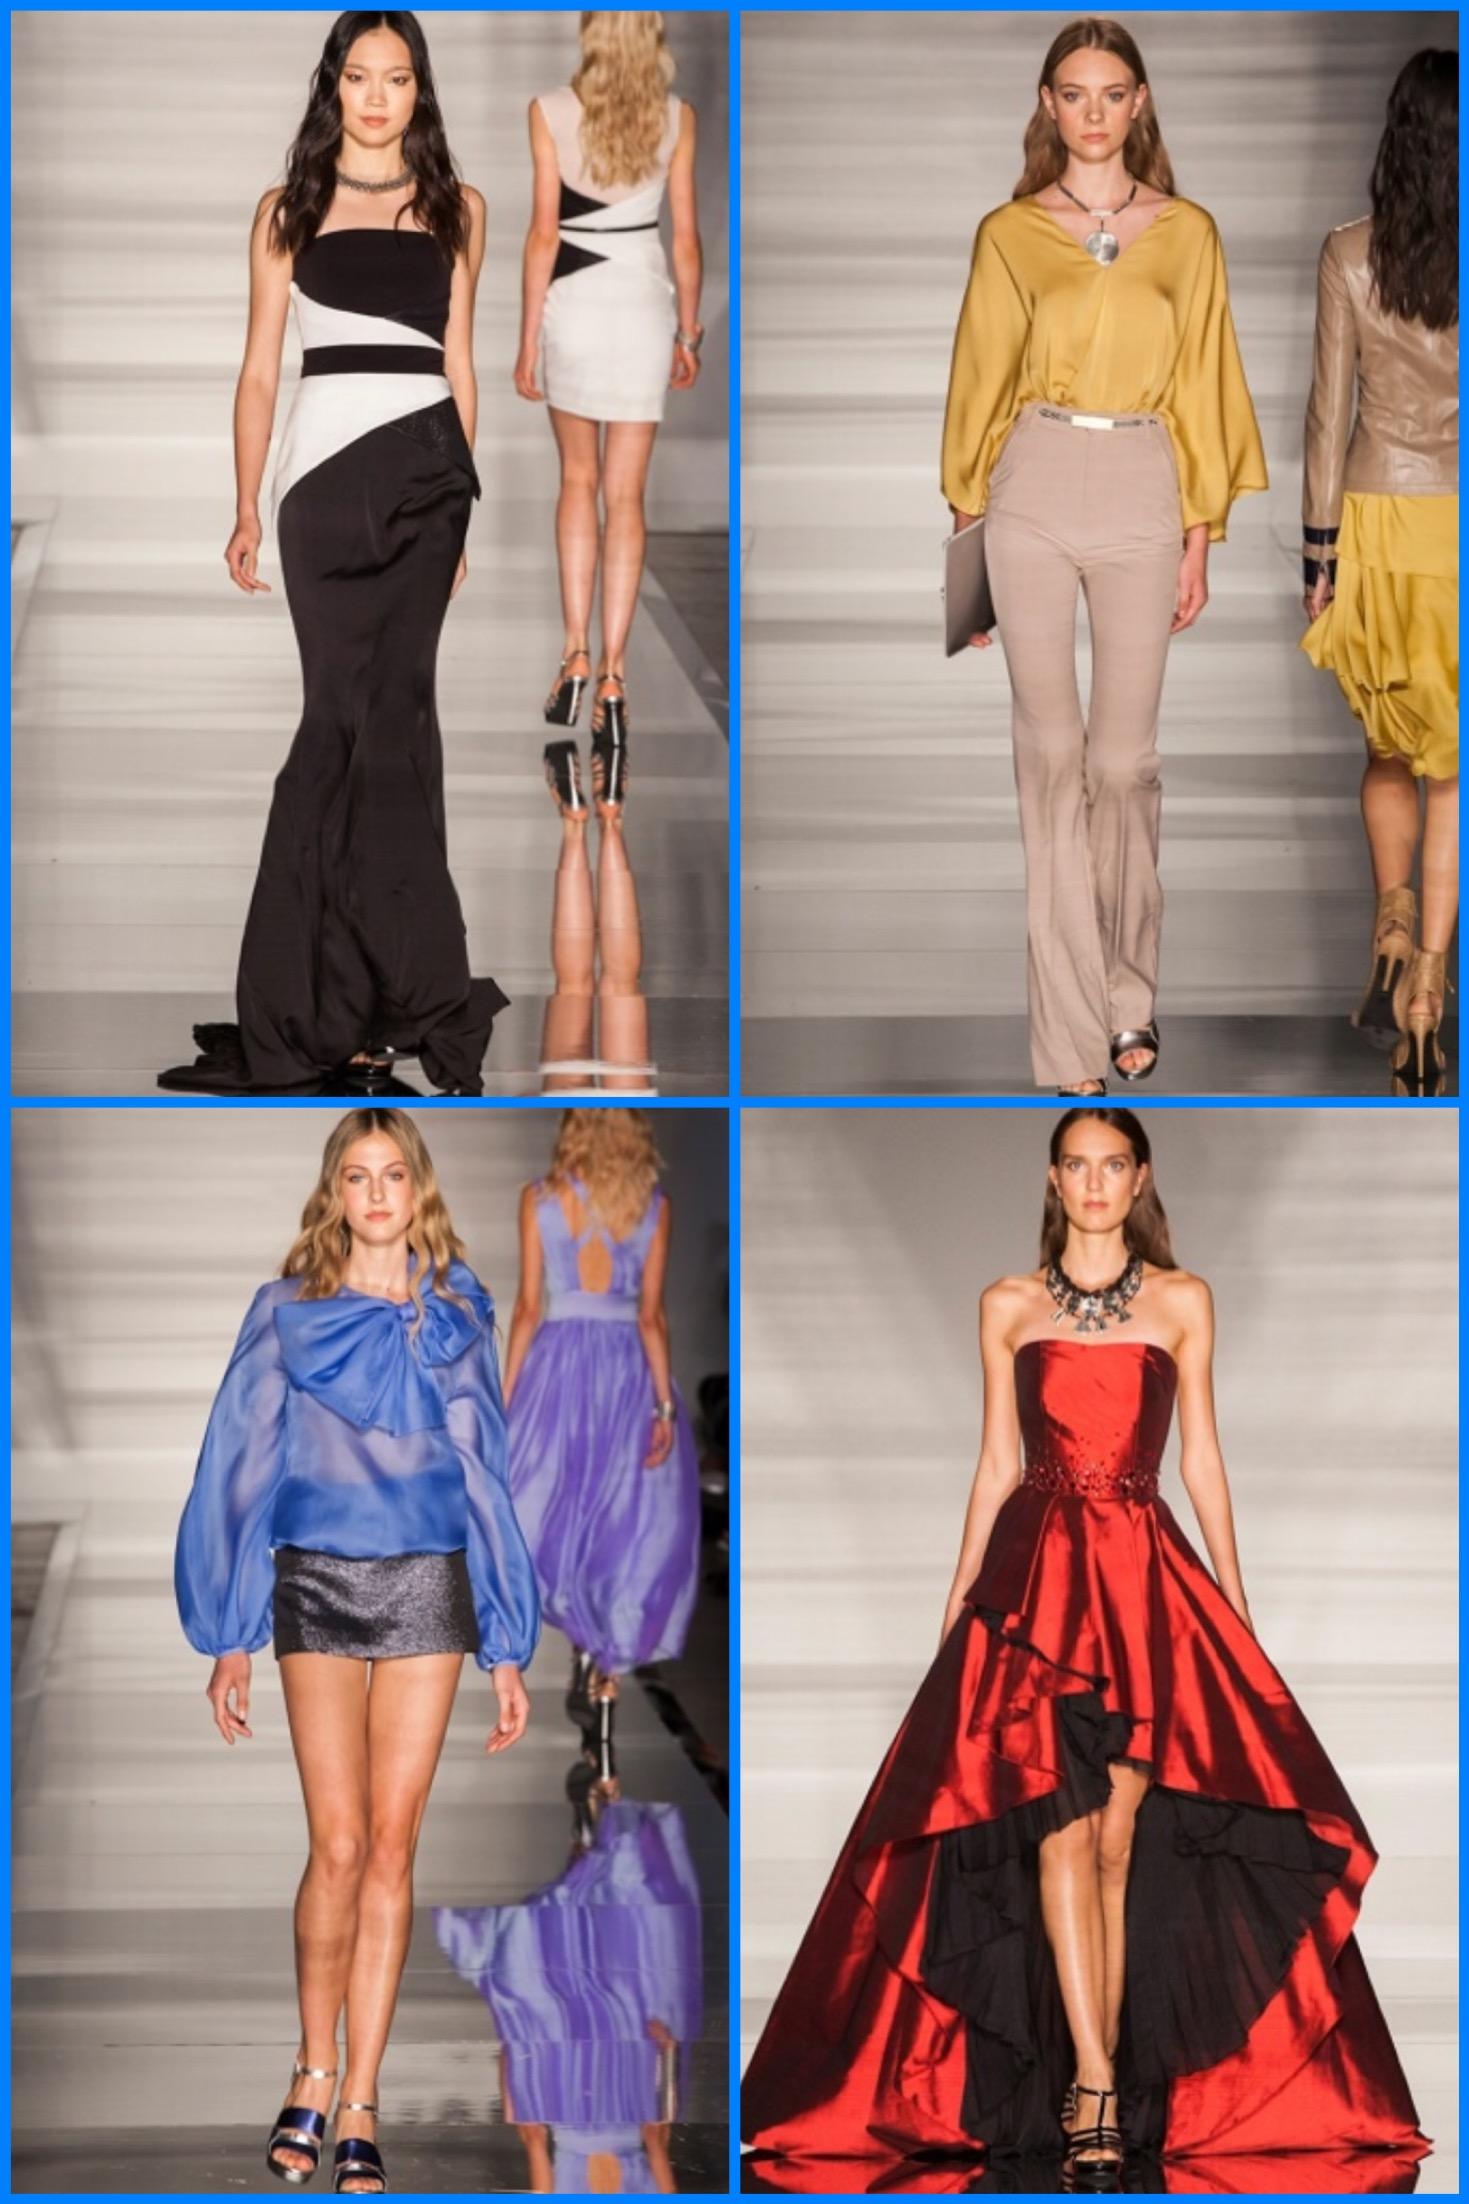 milano-fashion-week-pret-a-porter-spring-summer-2017-style-koradior